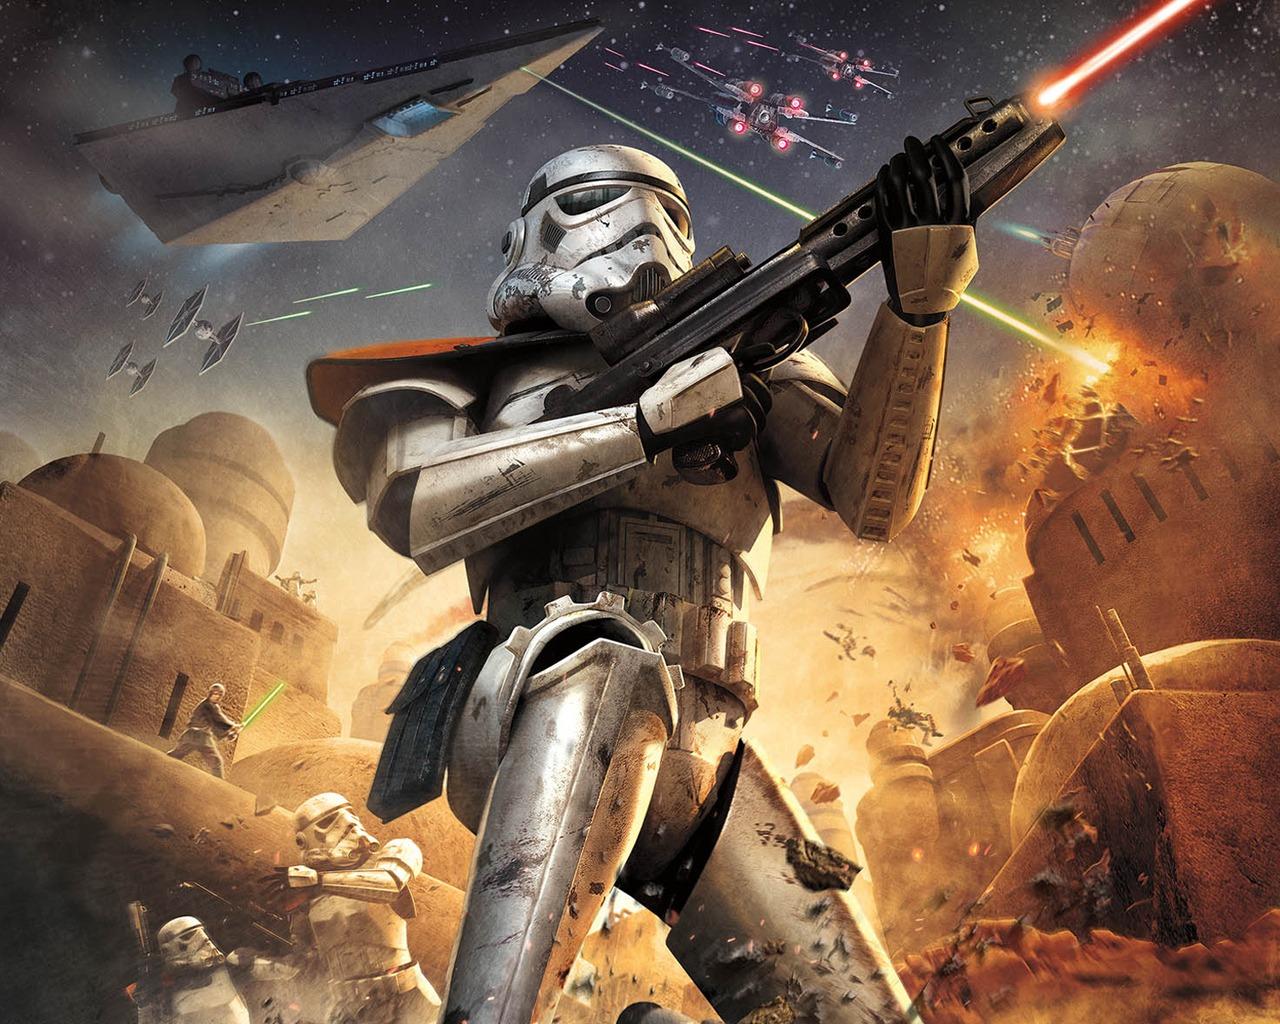 Star Wars Desktop Wallpapers FREE on Latorocom 1280x1024